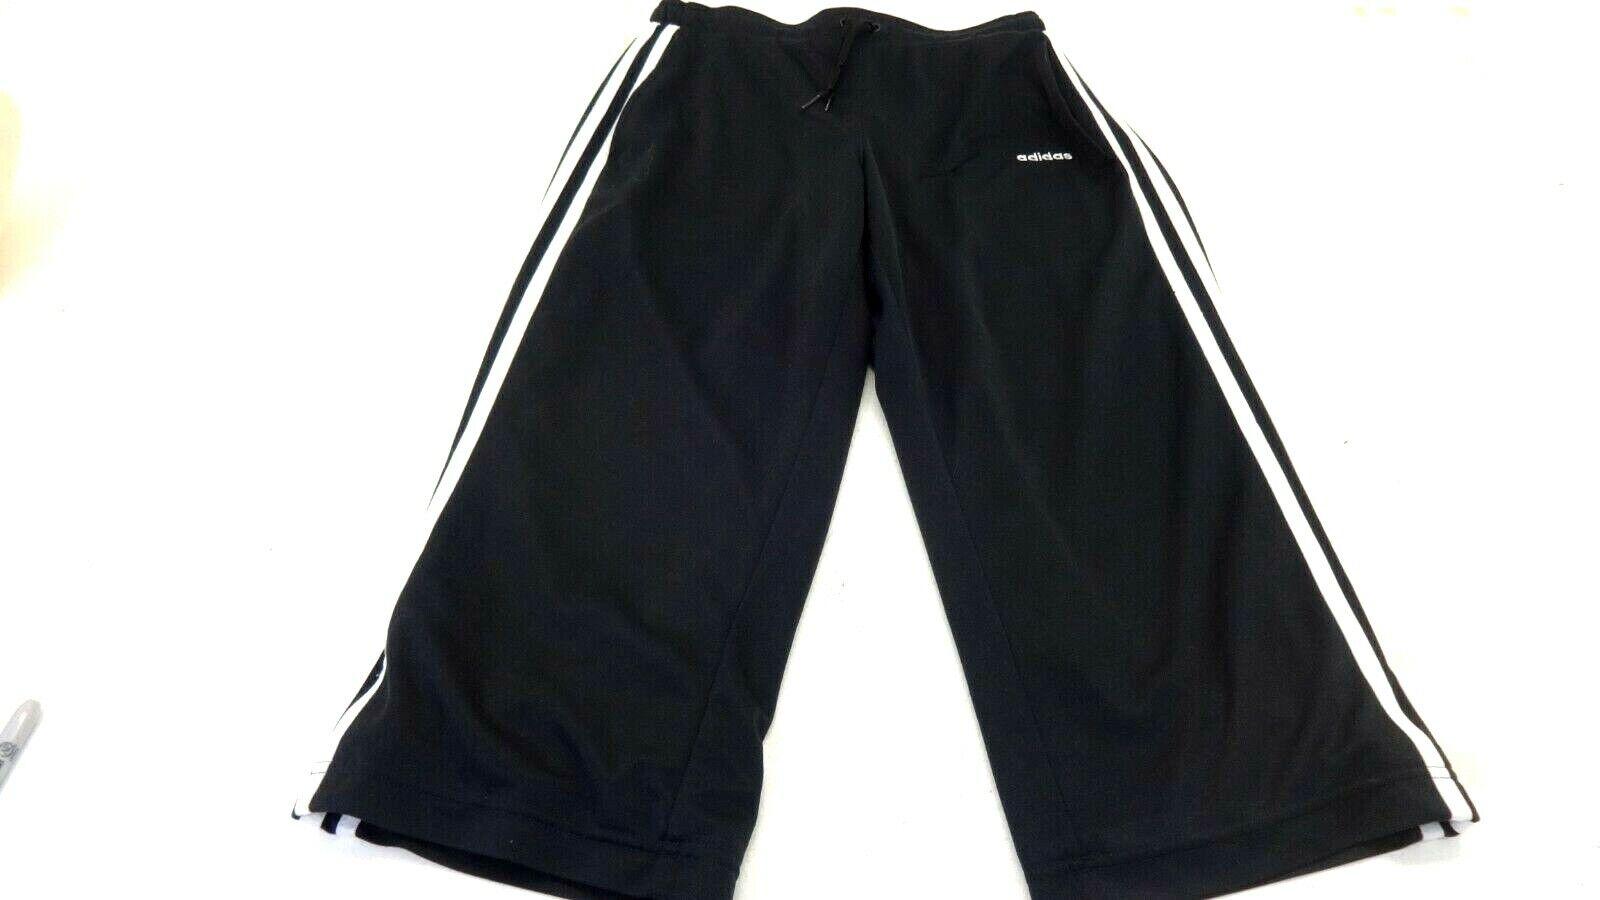 pantaloni felpati adidas donna